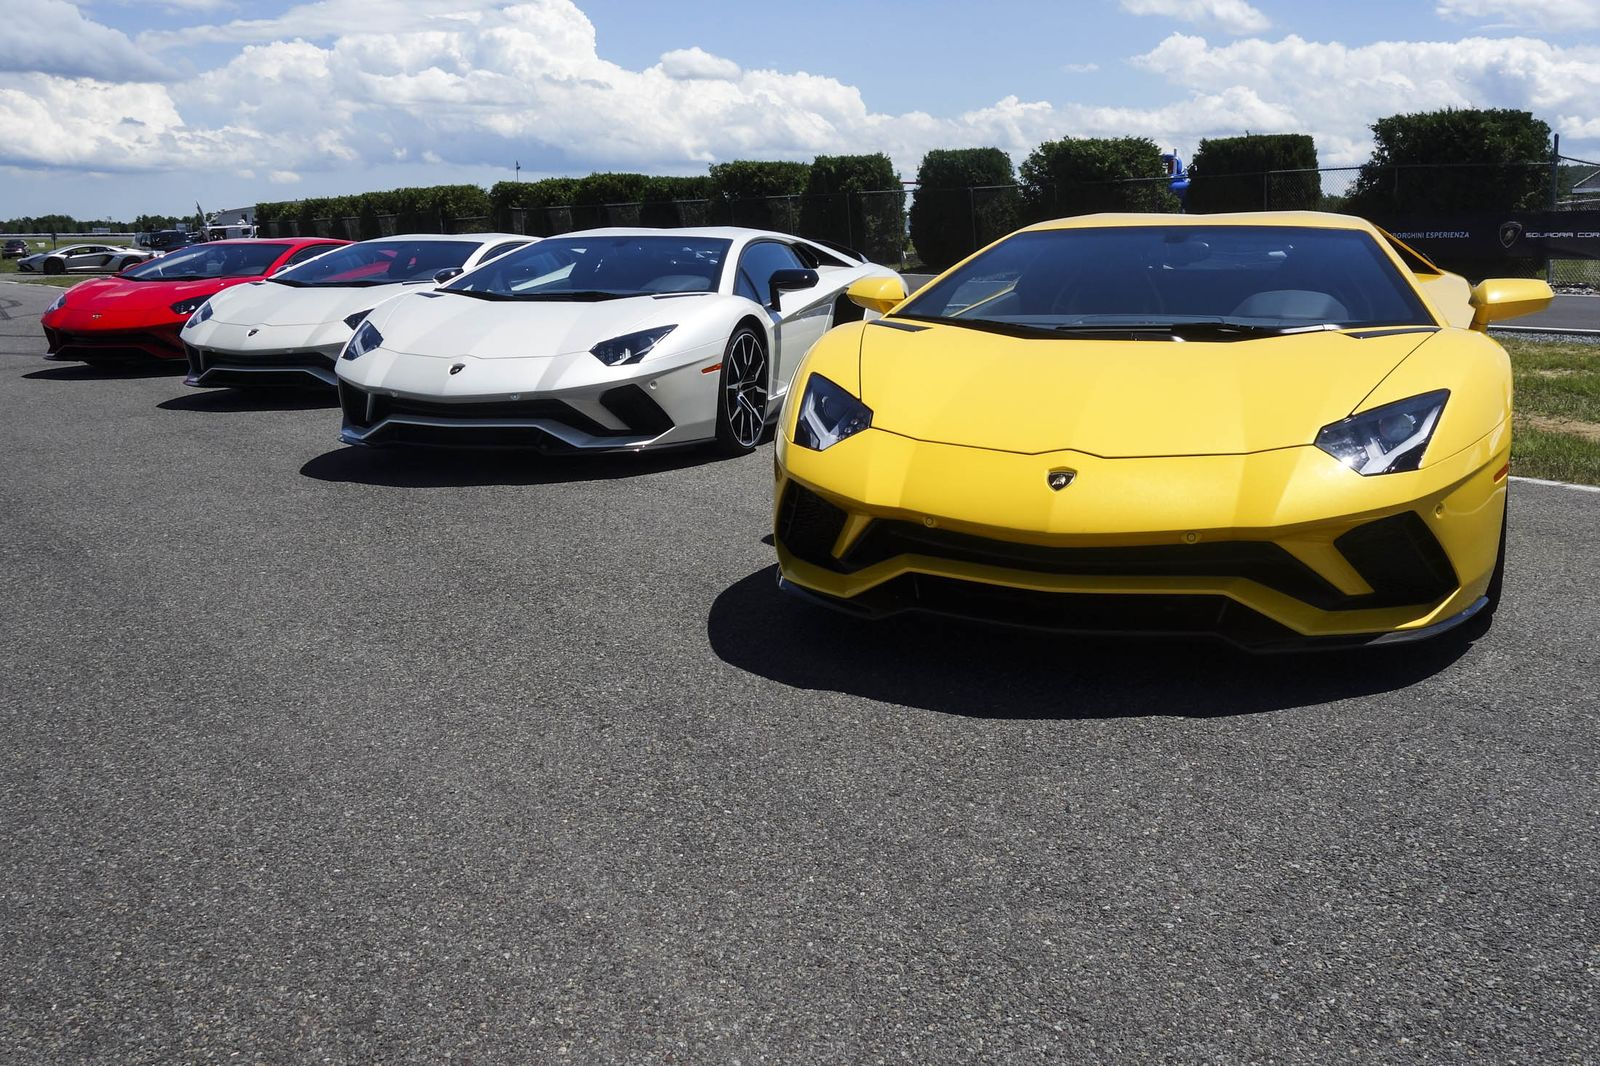 Supercar: Lamborghini Aventador S